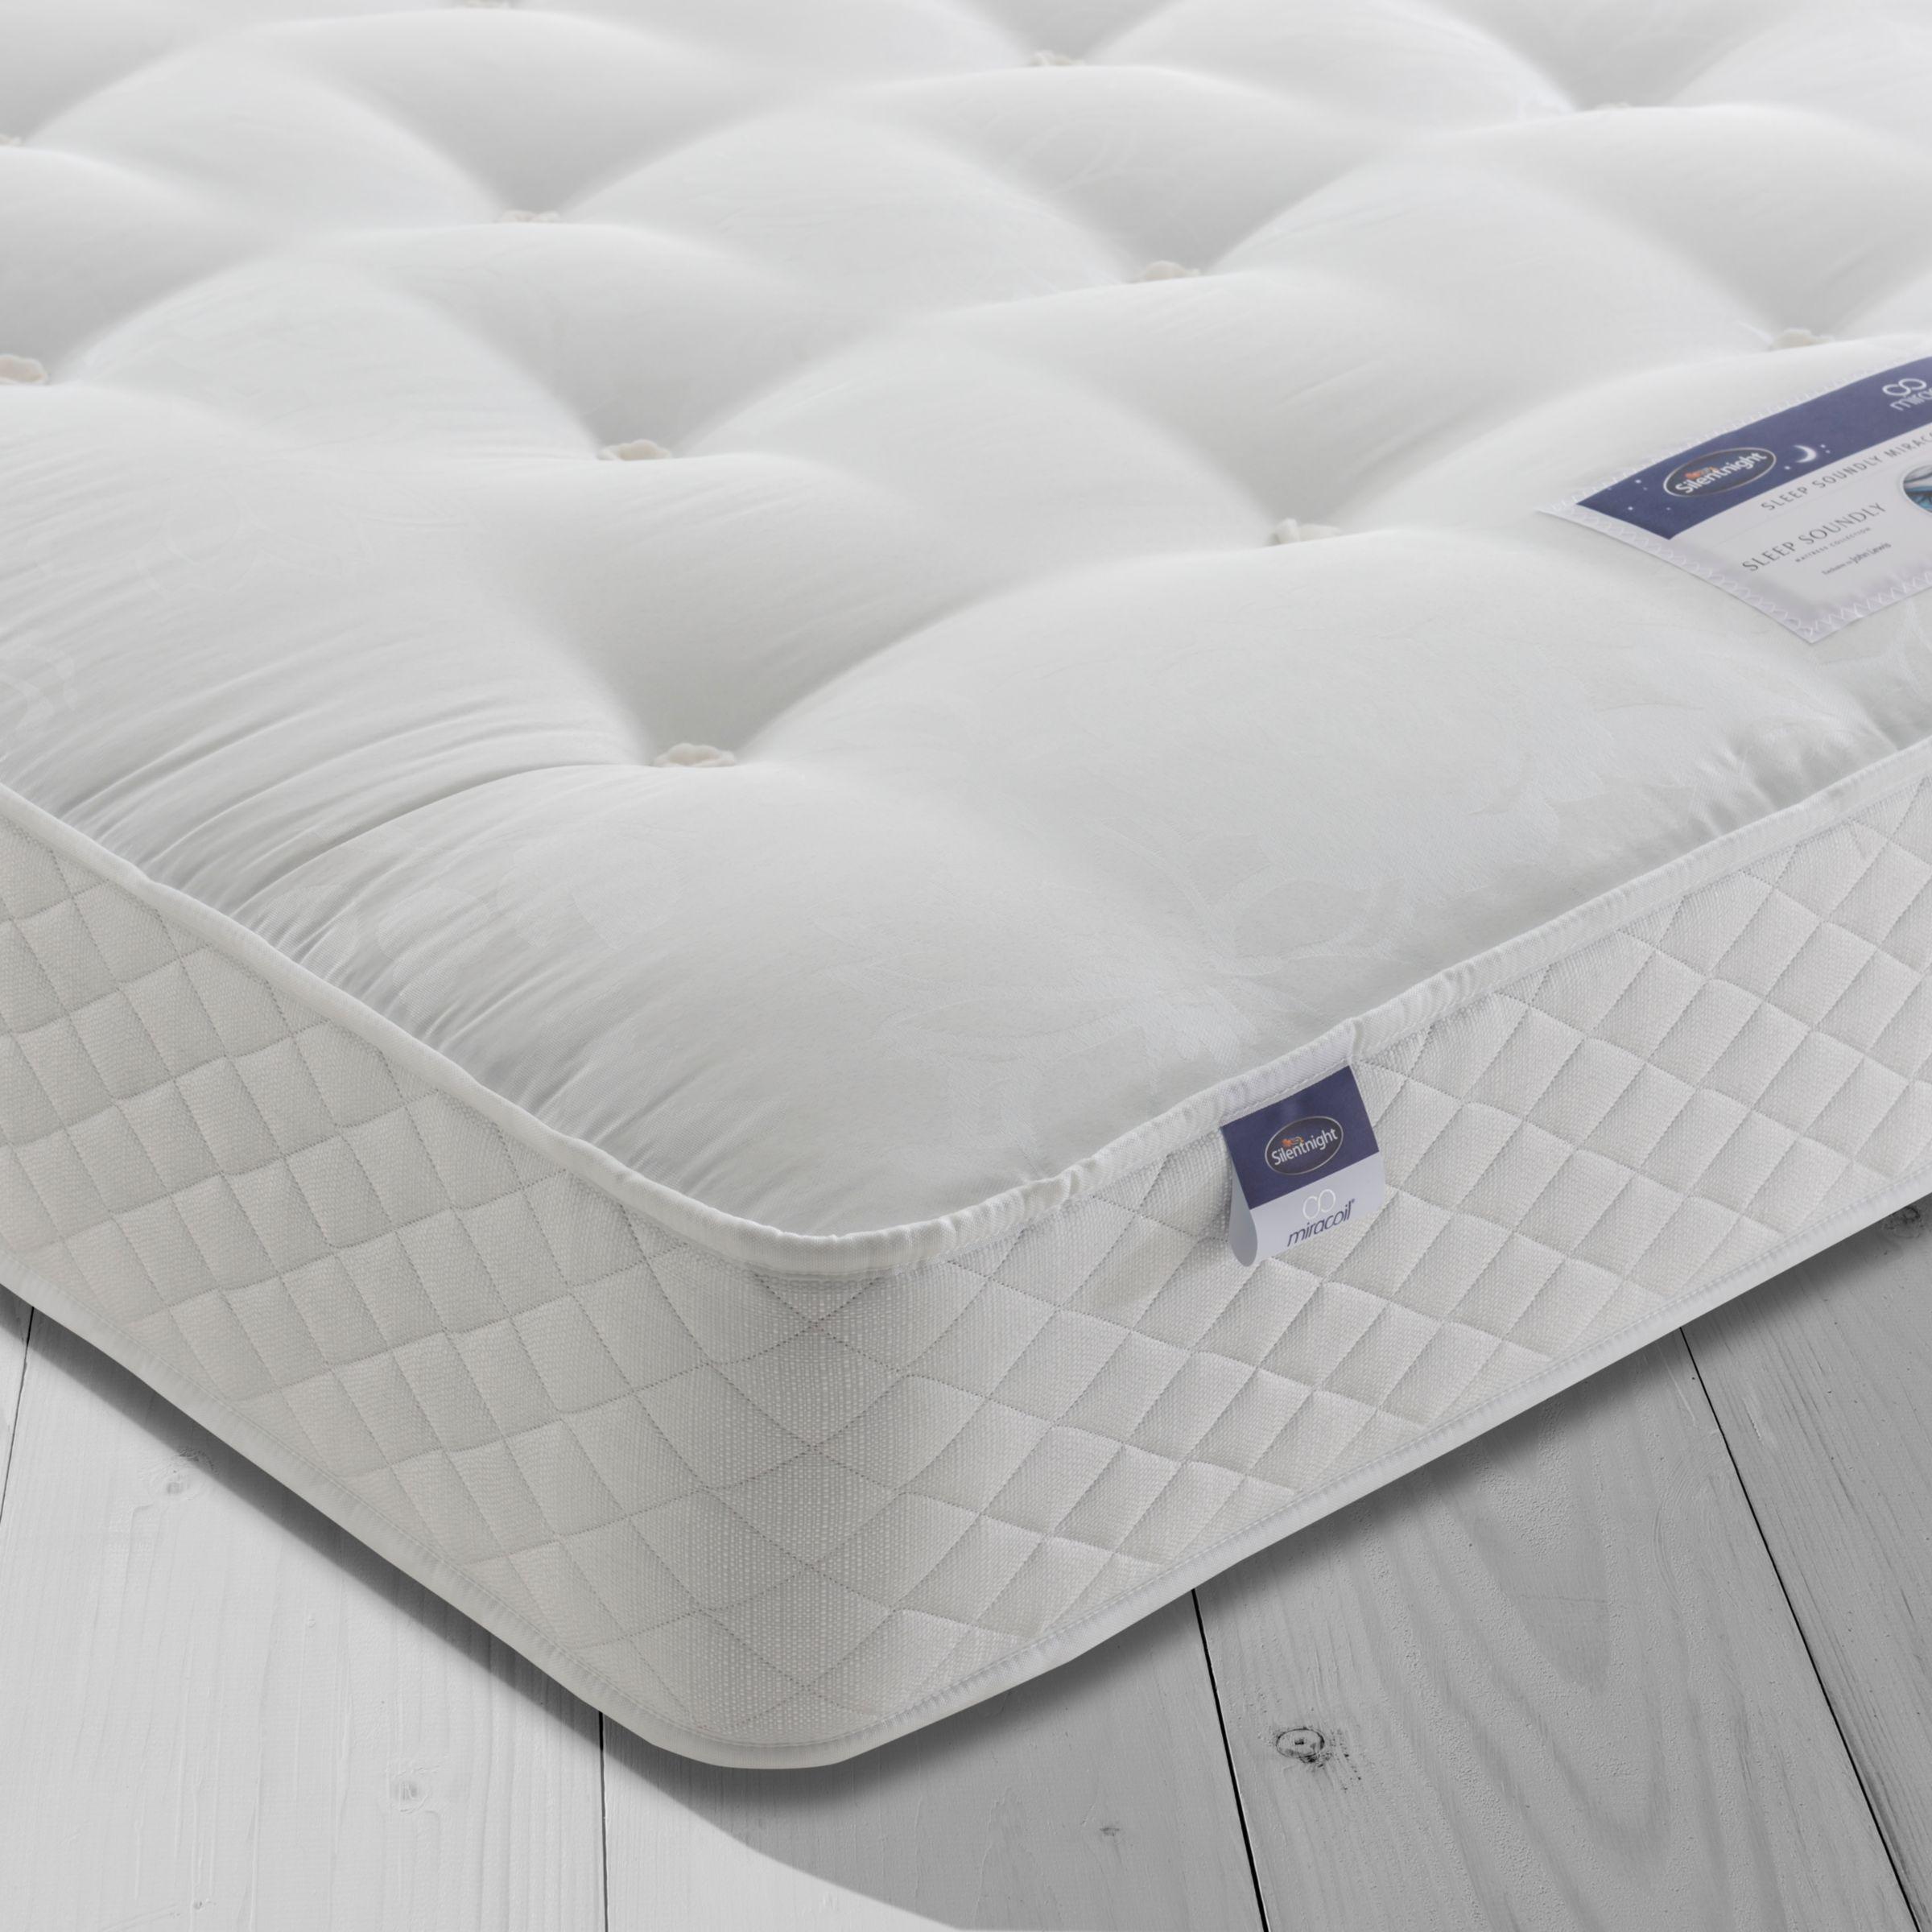 Silentnight Silentnight Sleep Soundly Miracoil Ortho Mattress, Firm, Double